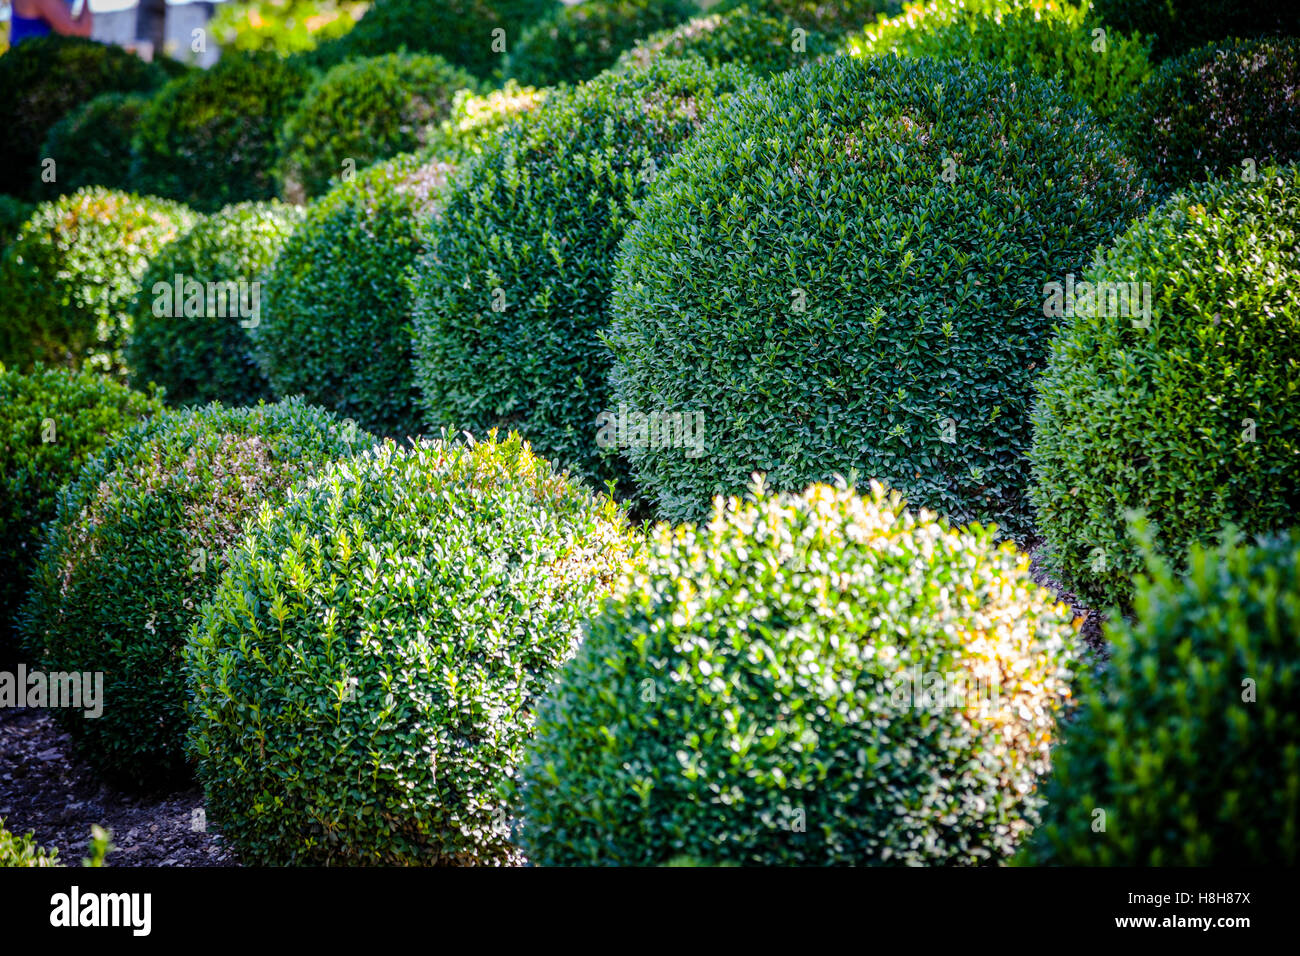 Boxwood   Green Garden Balls In France, Amboise Gardens